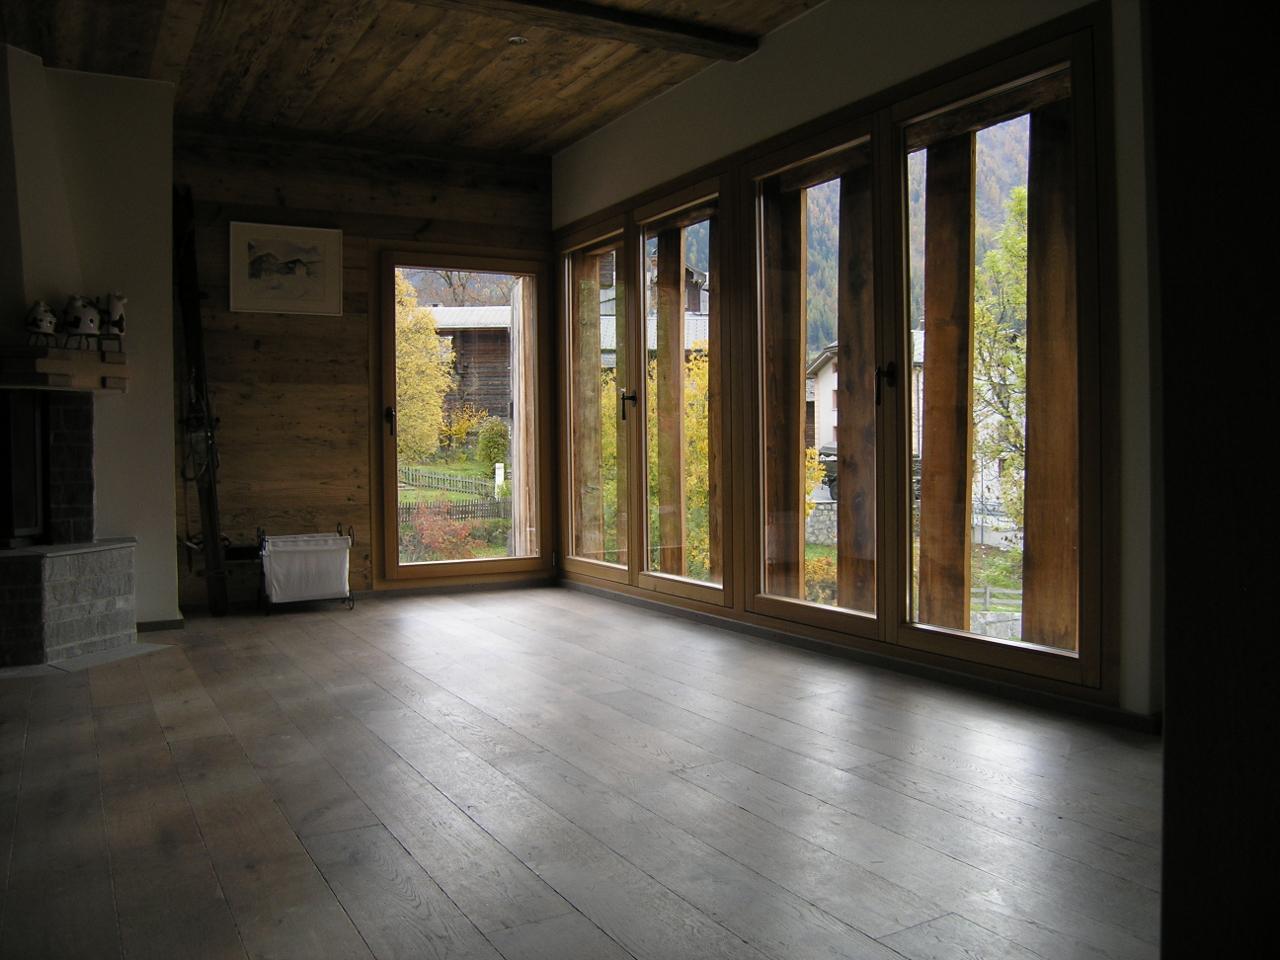 architekturb ro keller hans 3985 m nster geschinen. Black Bedroom Furniture Sets. Home Design Ideas